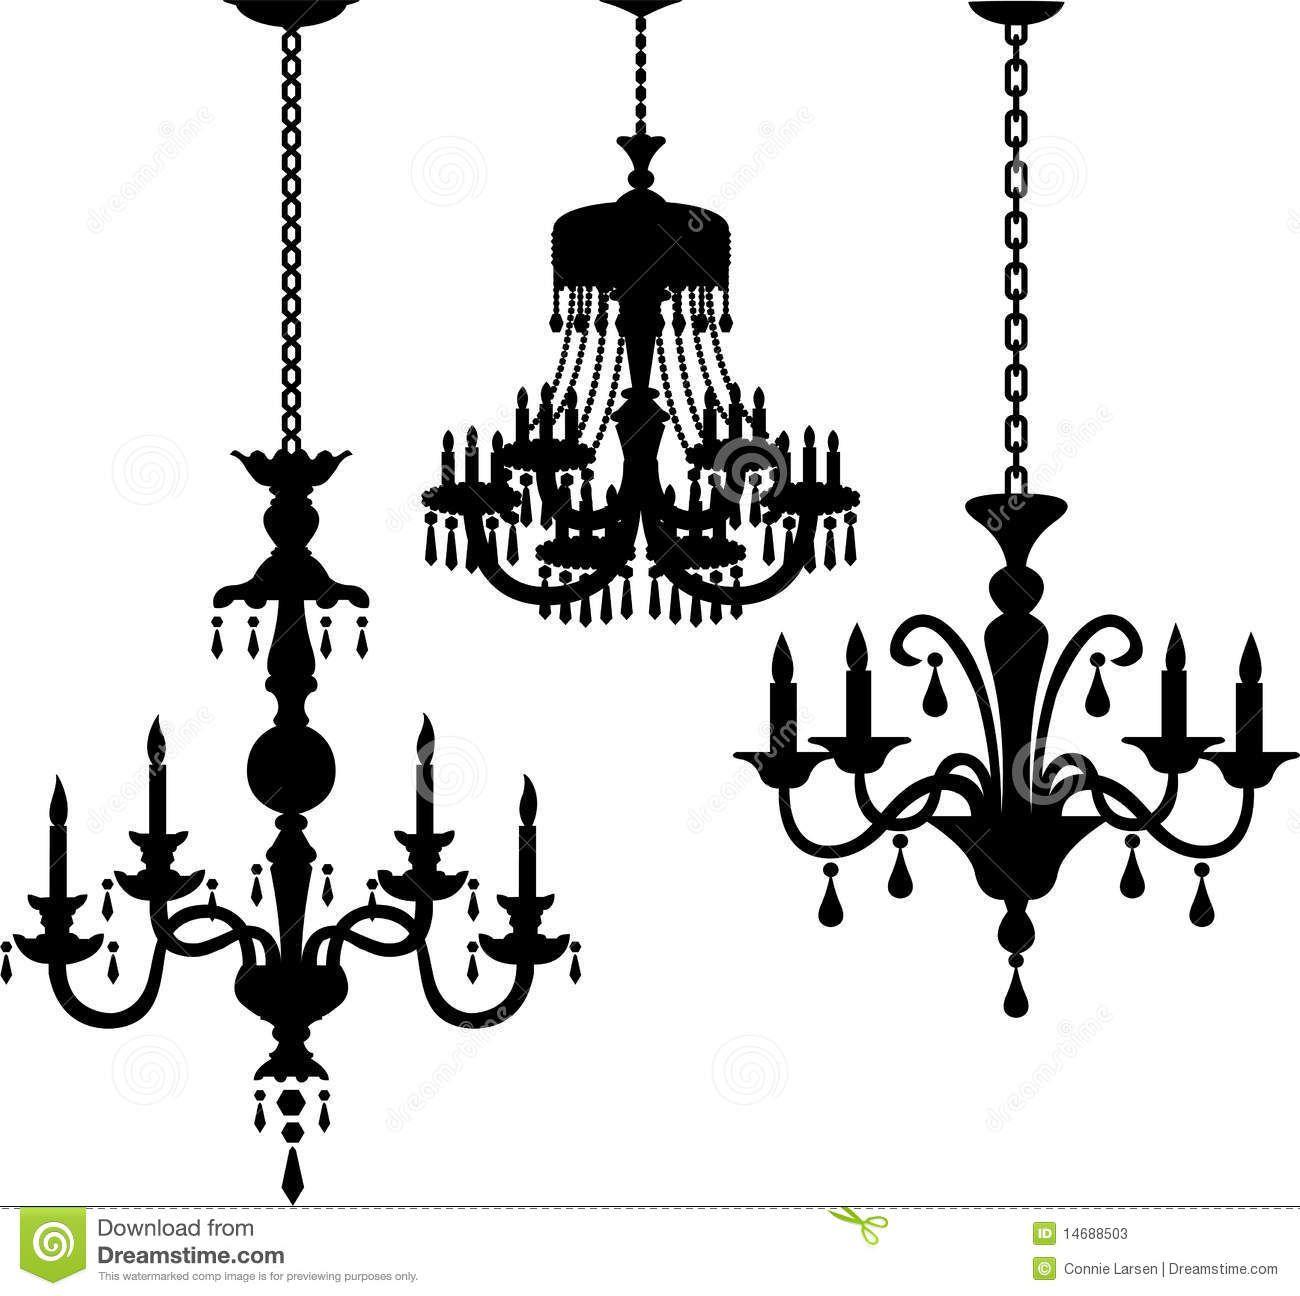 Chandelier silhouette clip art free diy craft ideas pinterest chandelier silhouette clip art free arubaitofo Gallery